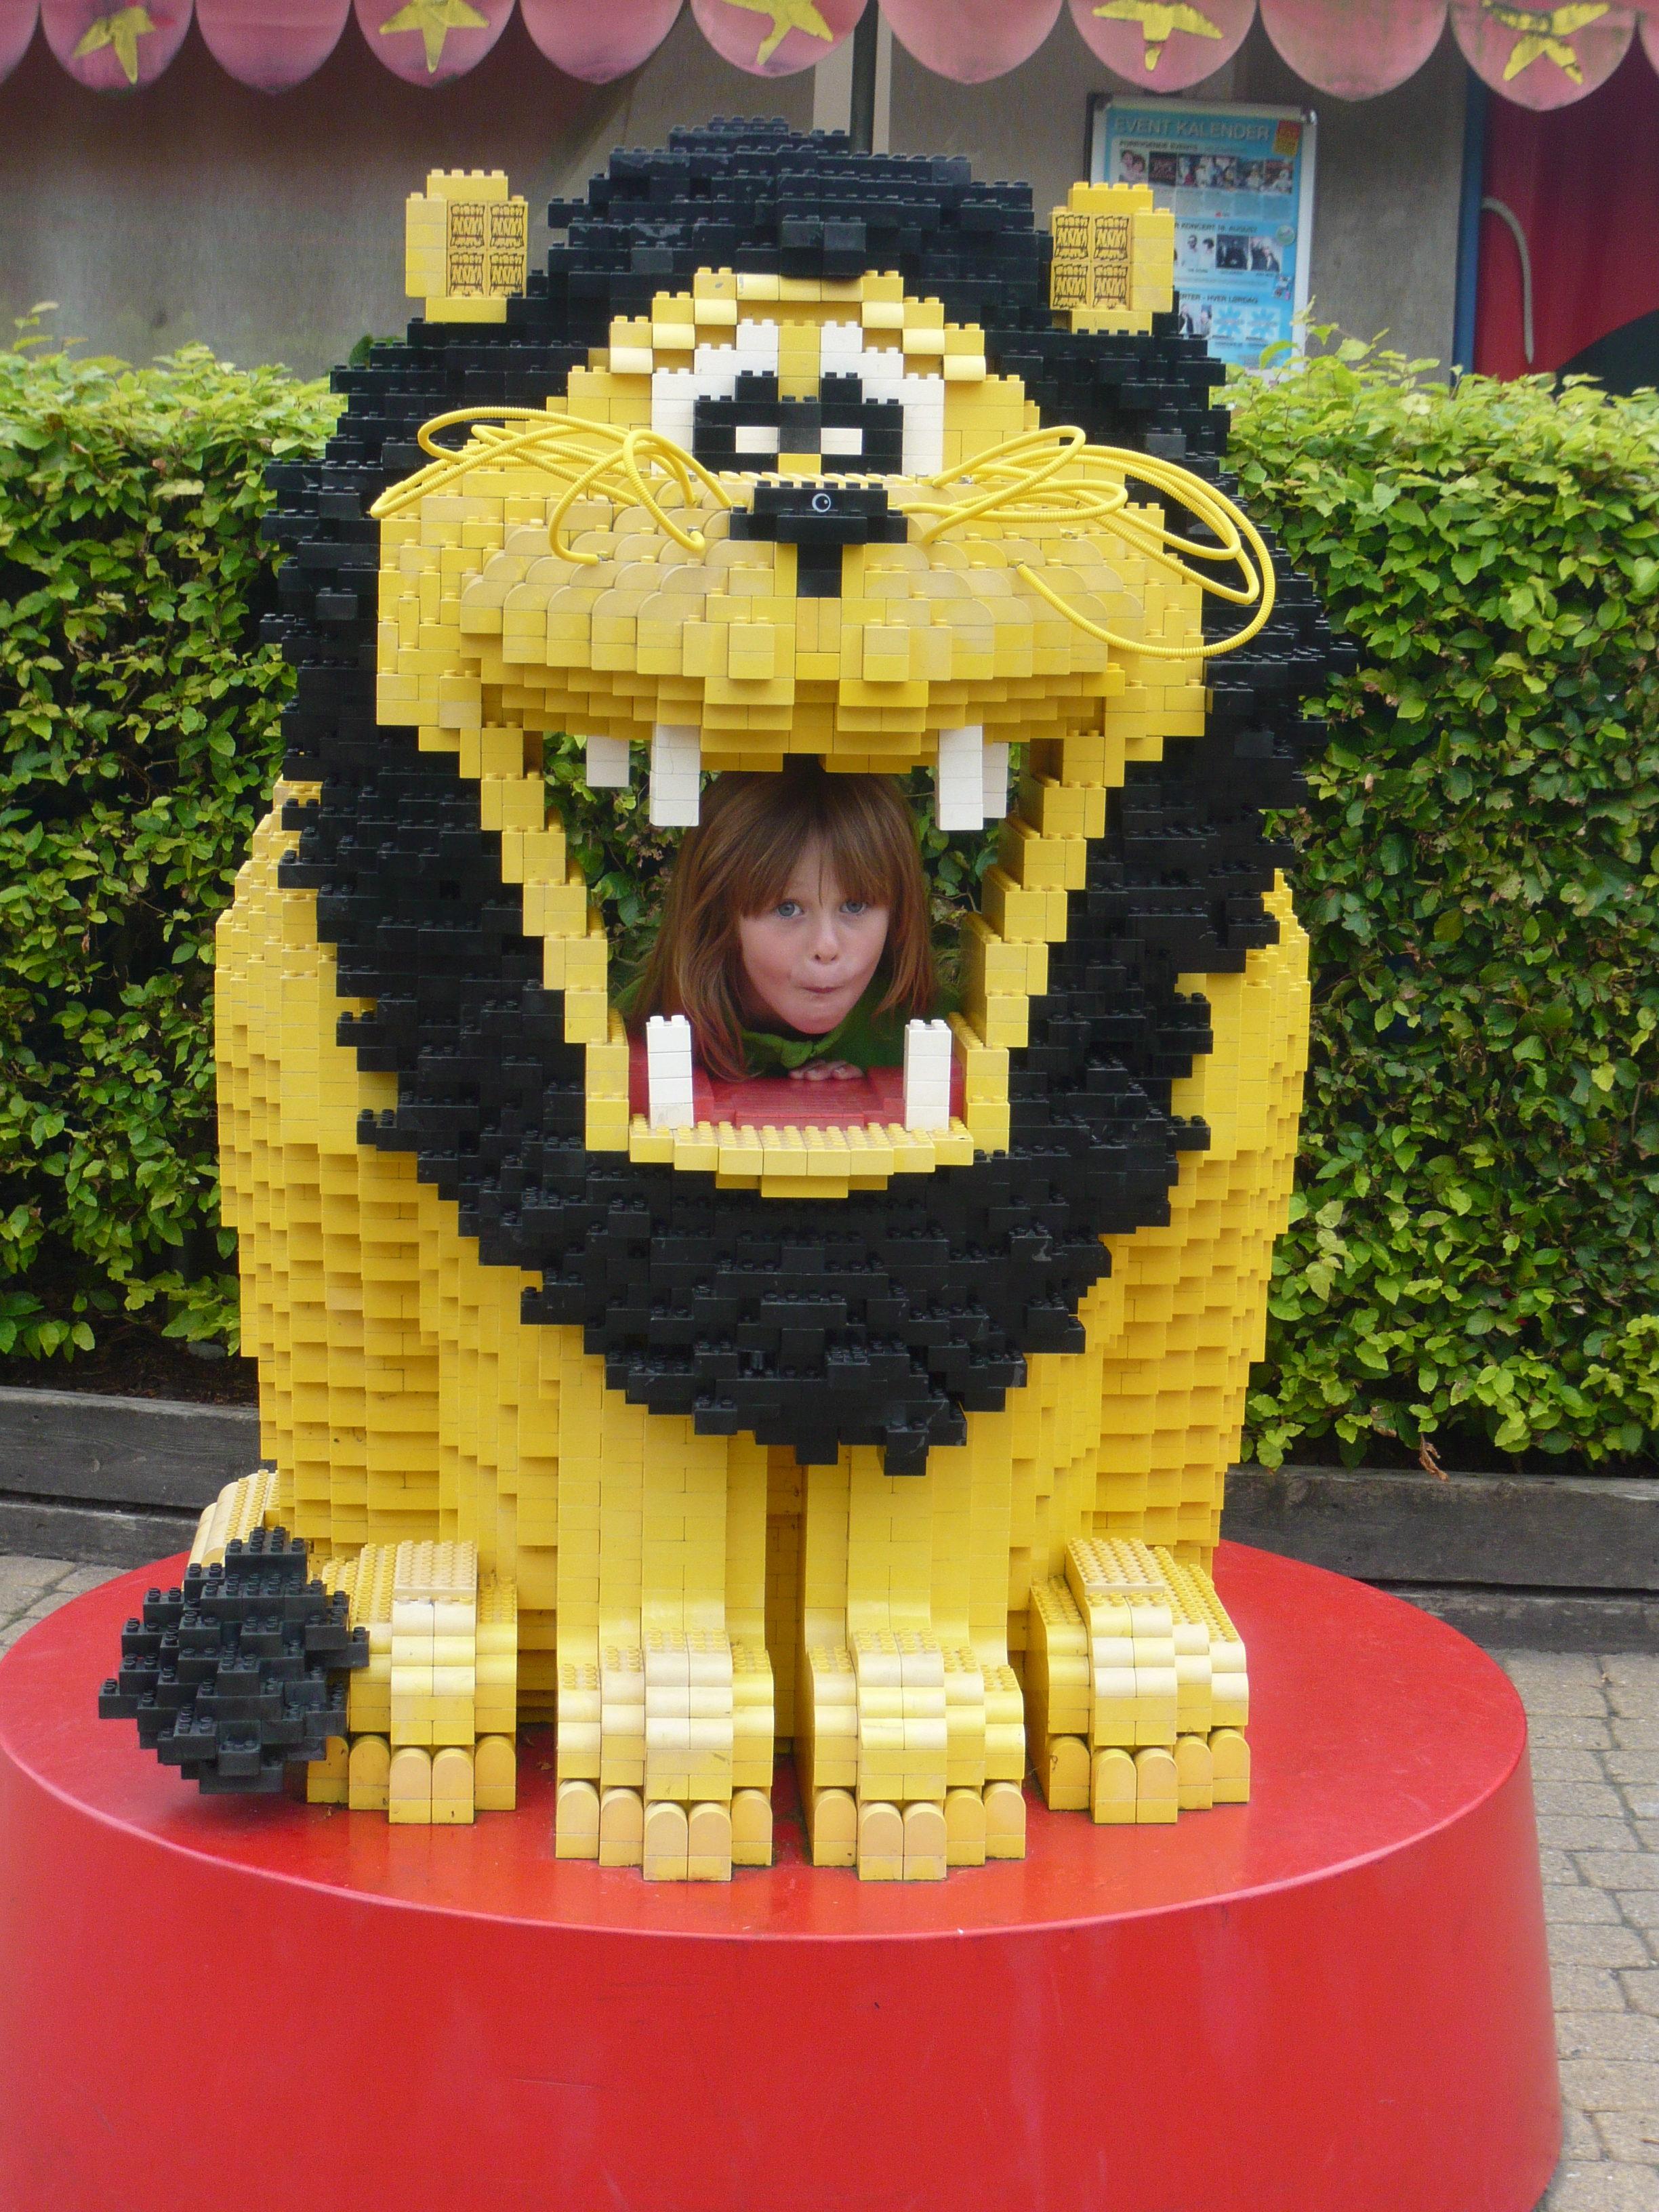 Miniland in Legoland Billund